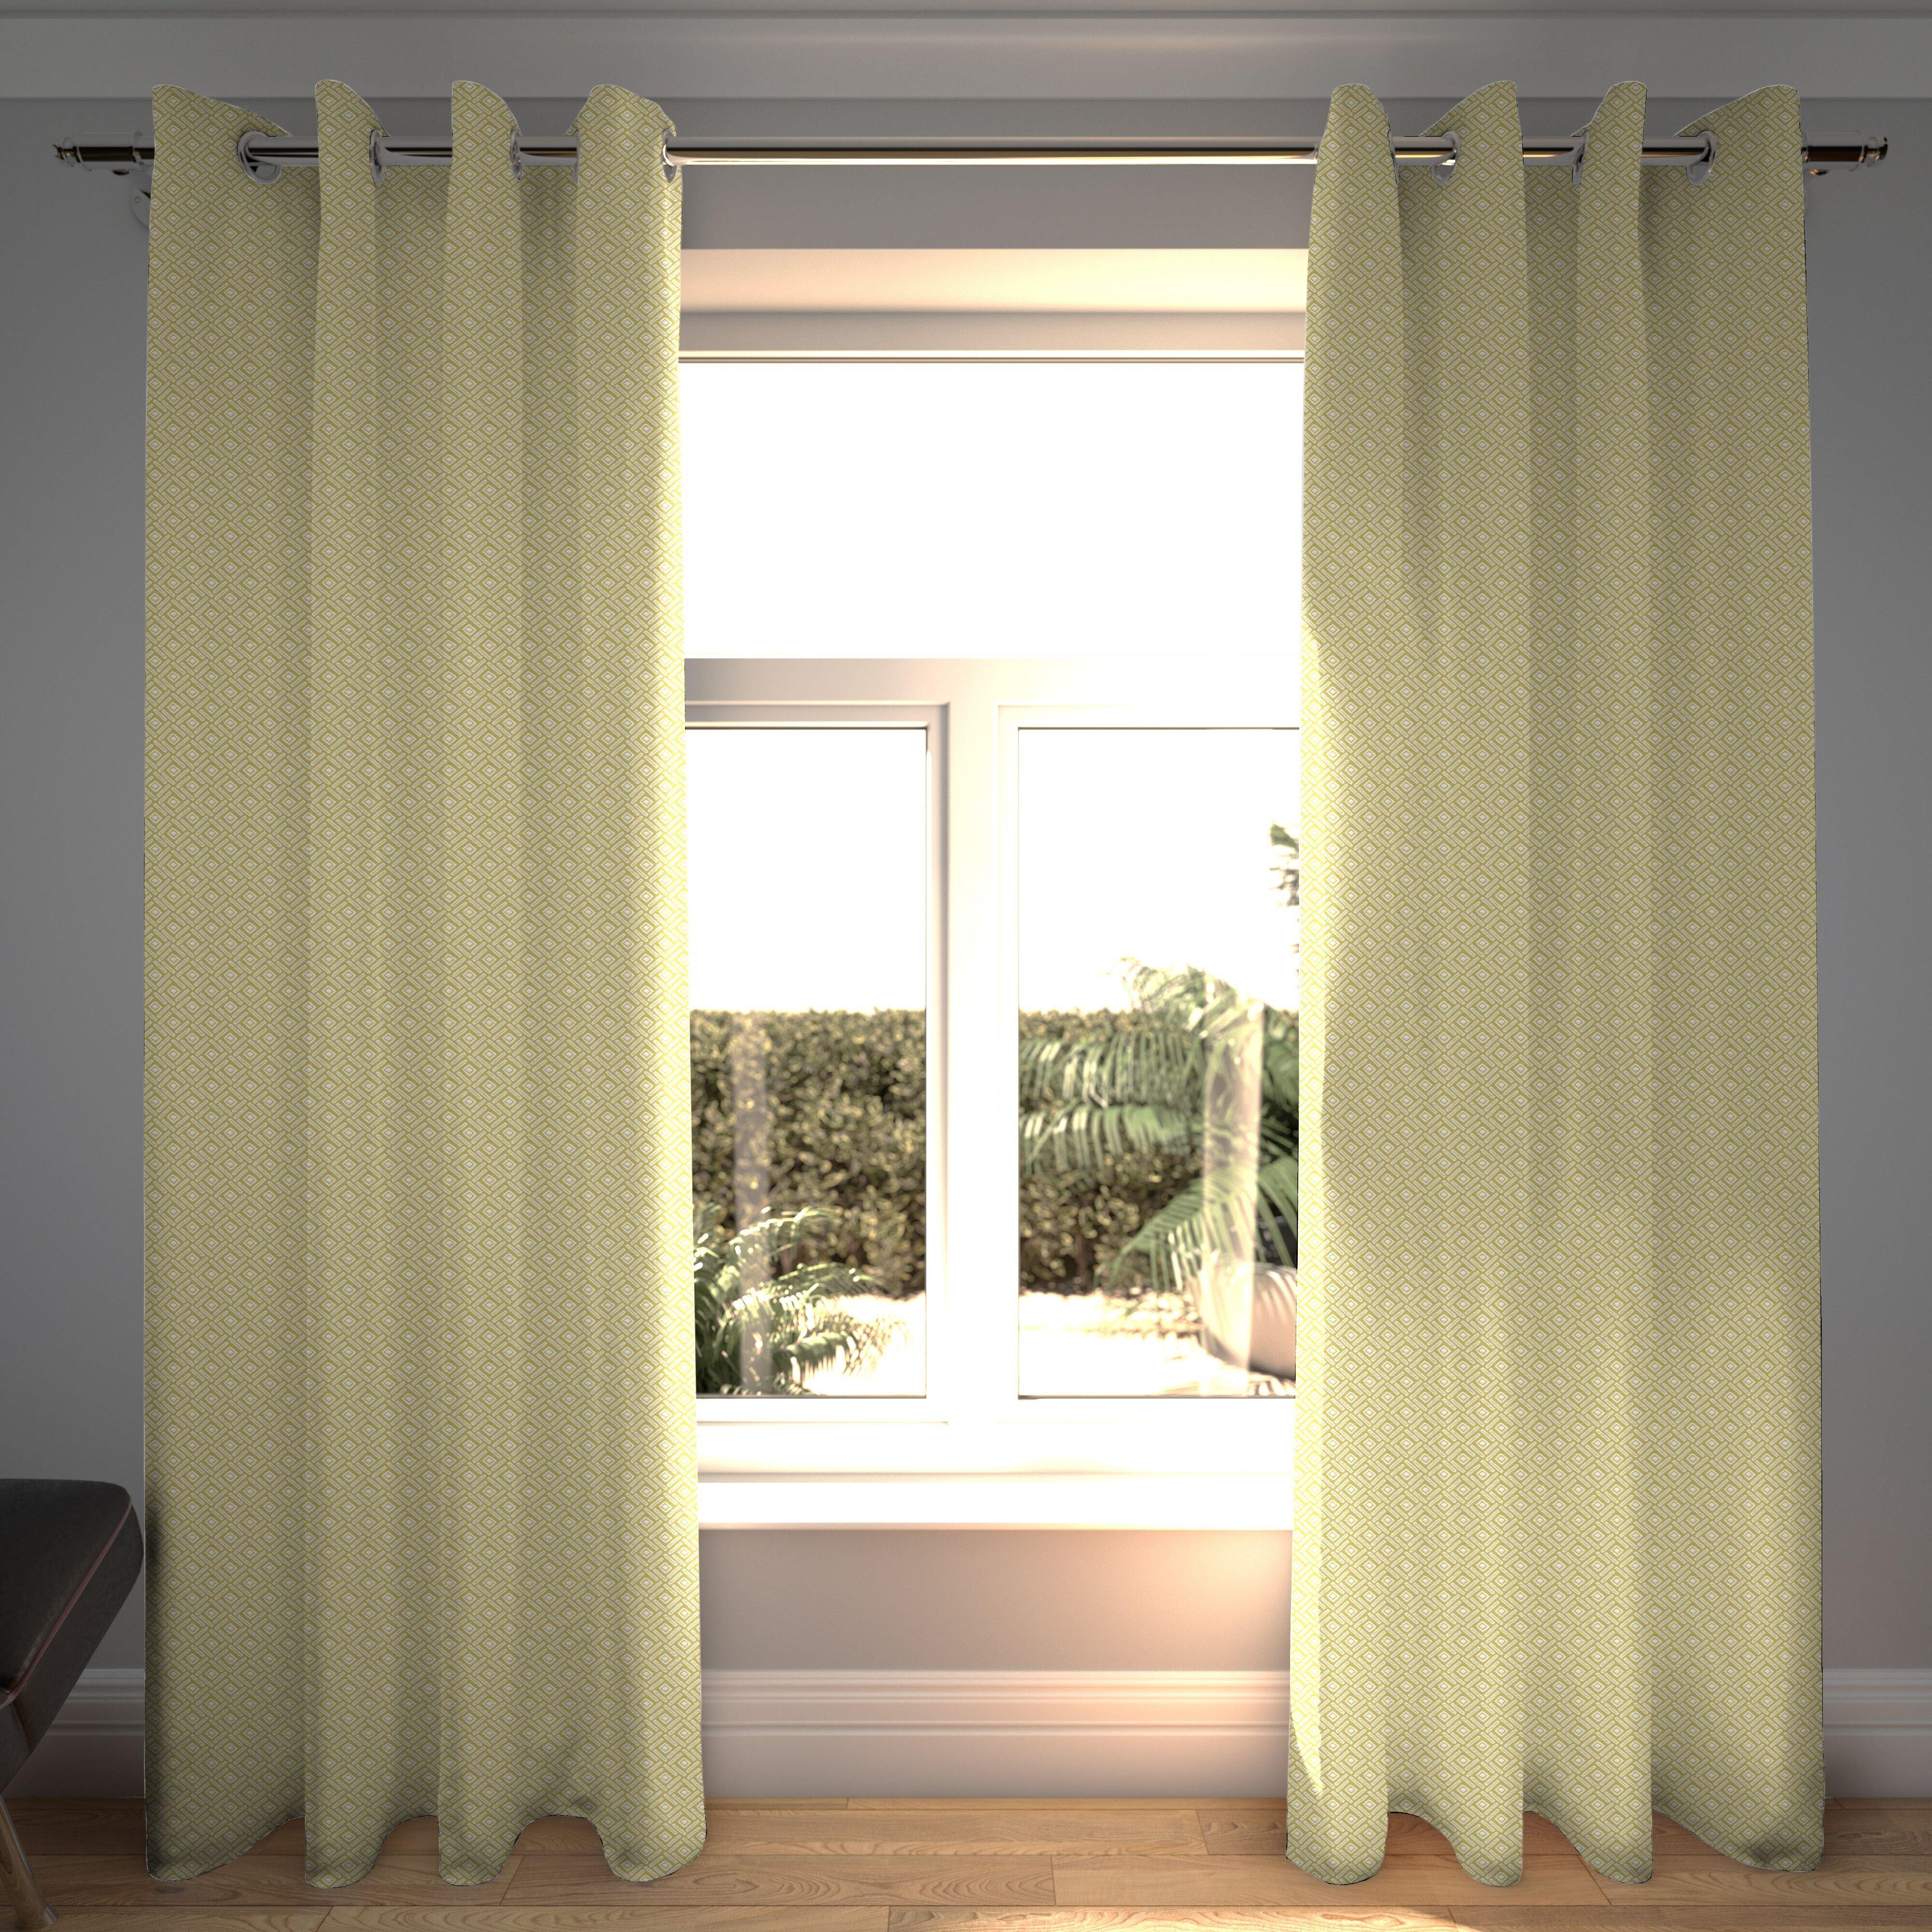 Mid Century Modern Blackout Curtains You Ll Love In 2021 Wayfair